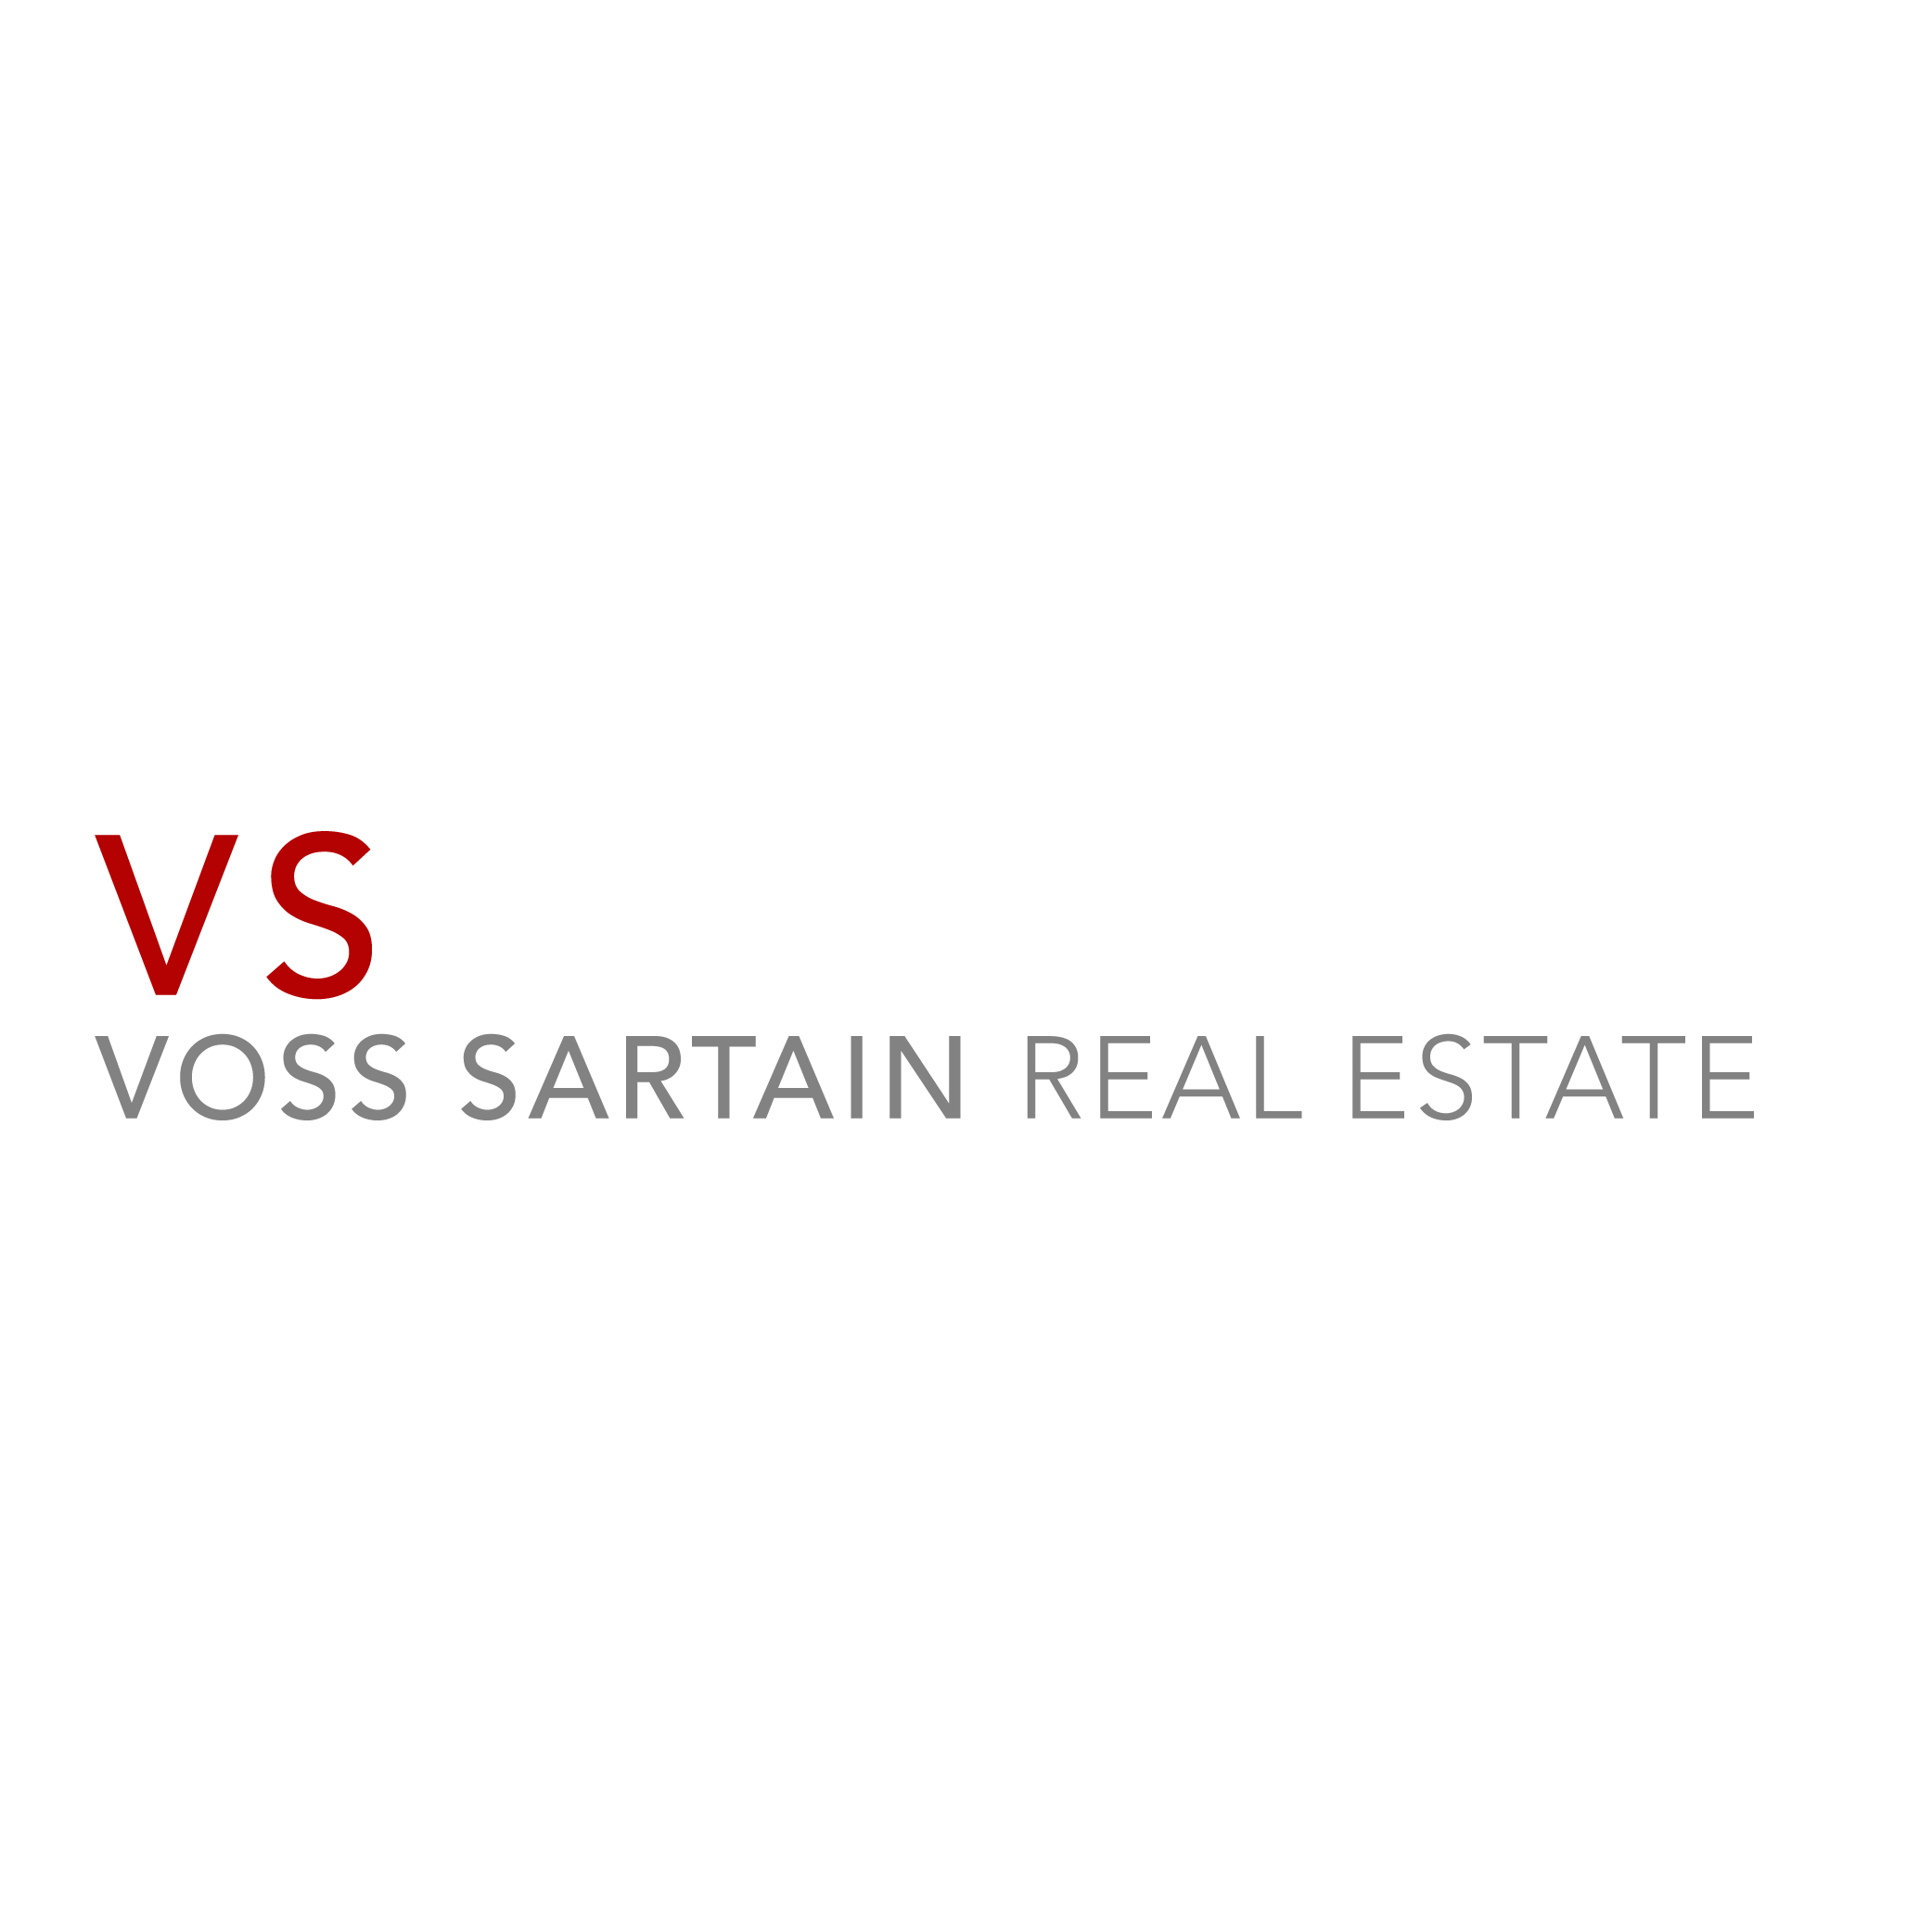 Voss Sartain Real Estate